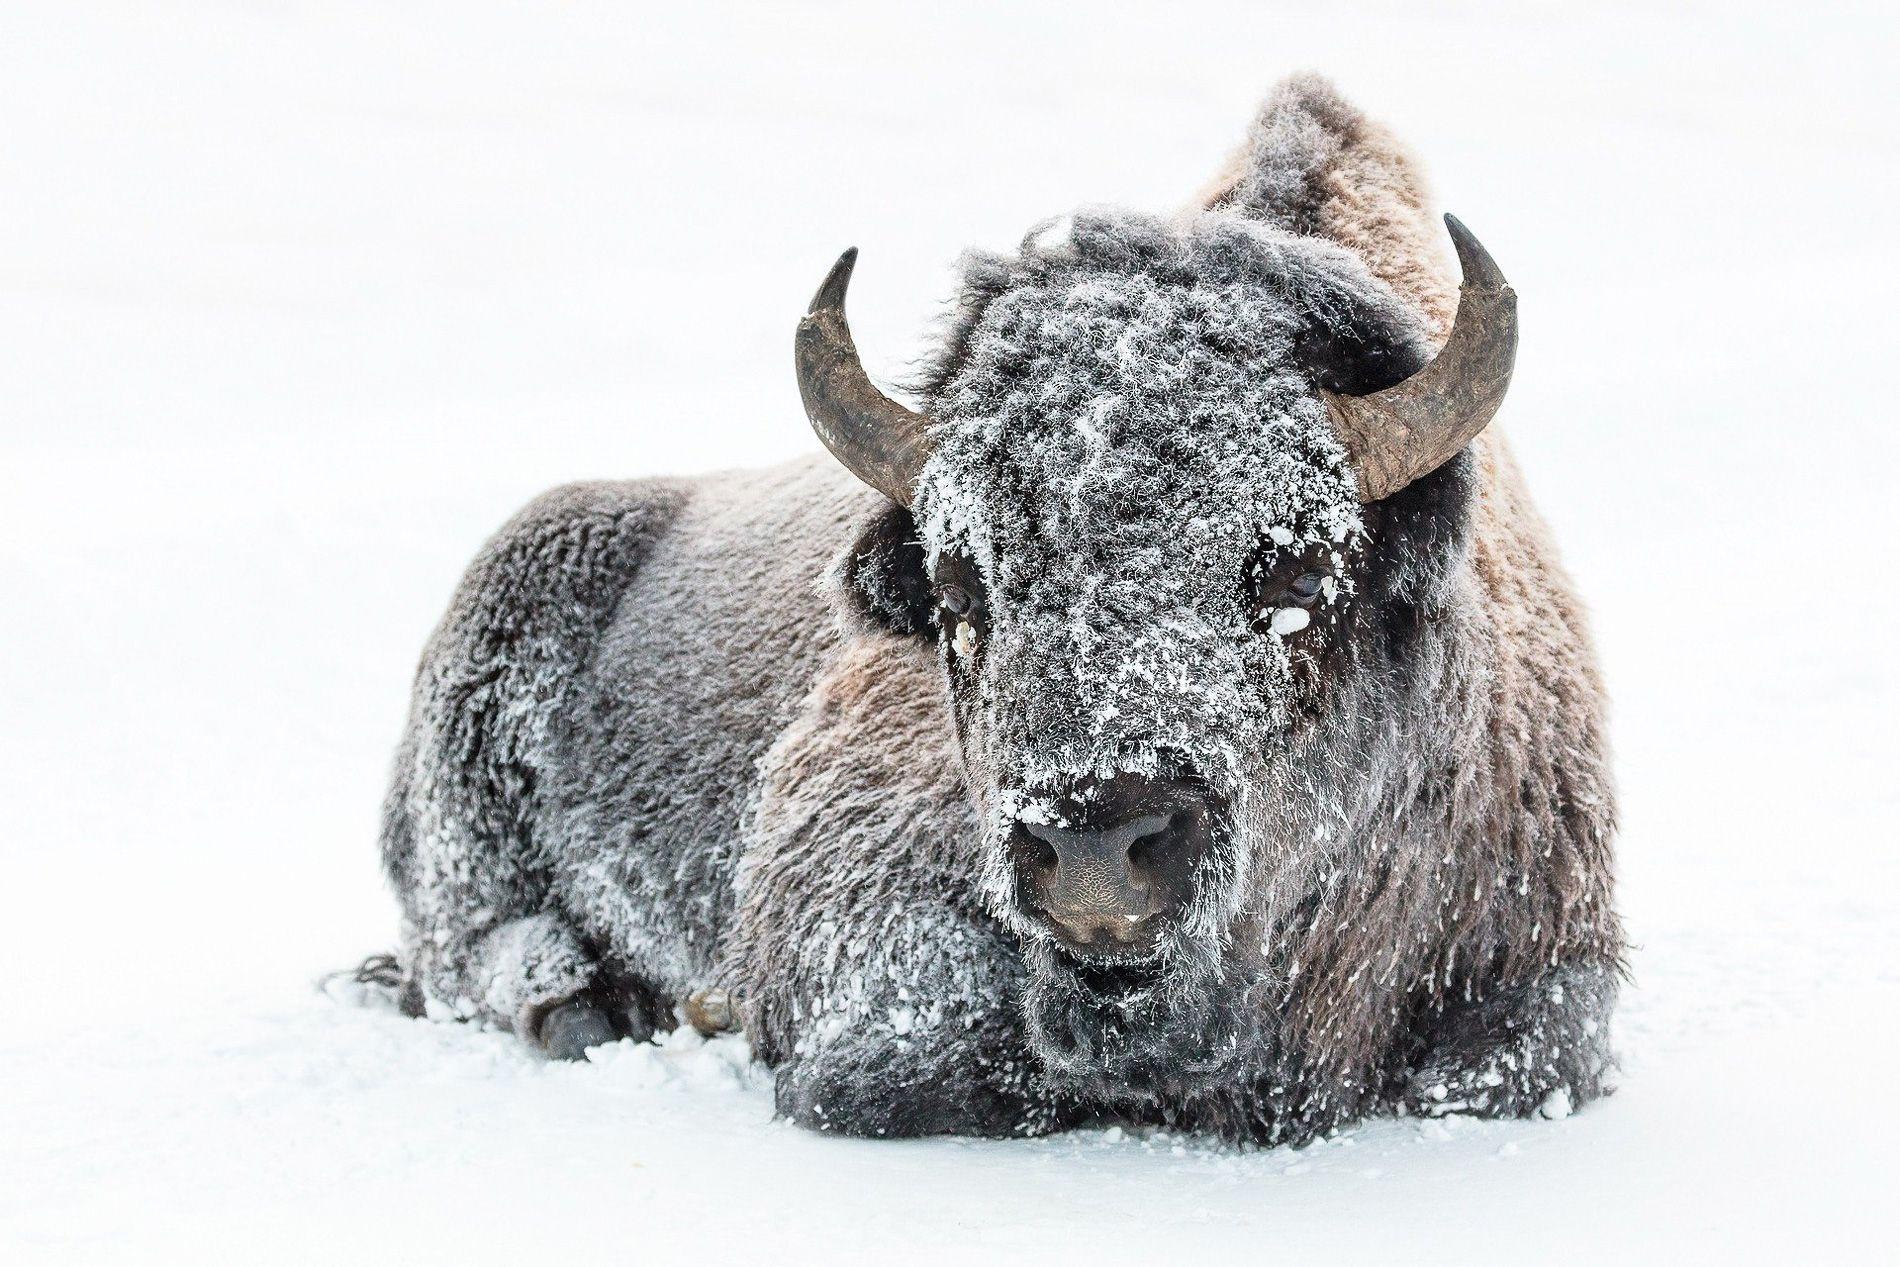 Alpes maritimes | conseils | voyage | monts d'azur | safari | animaux | mademoiselle-voyage